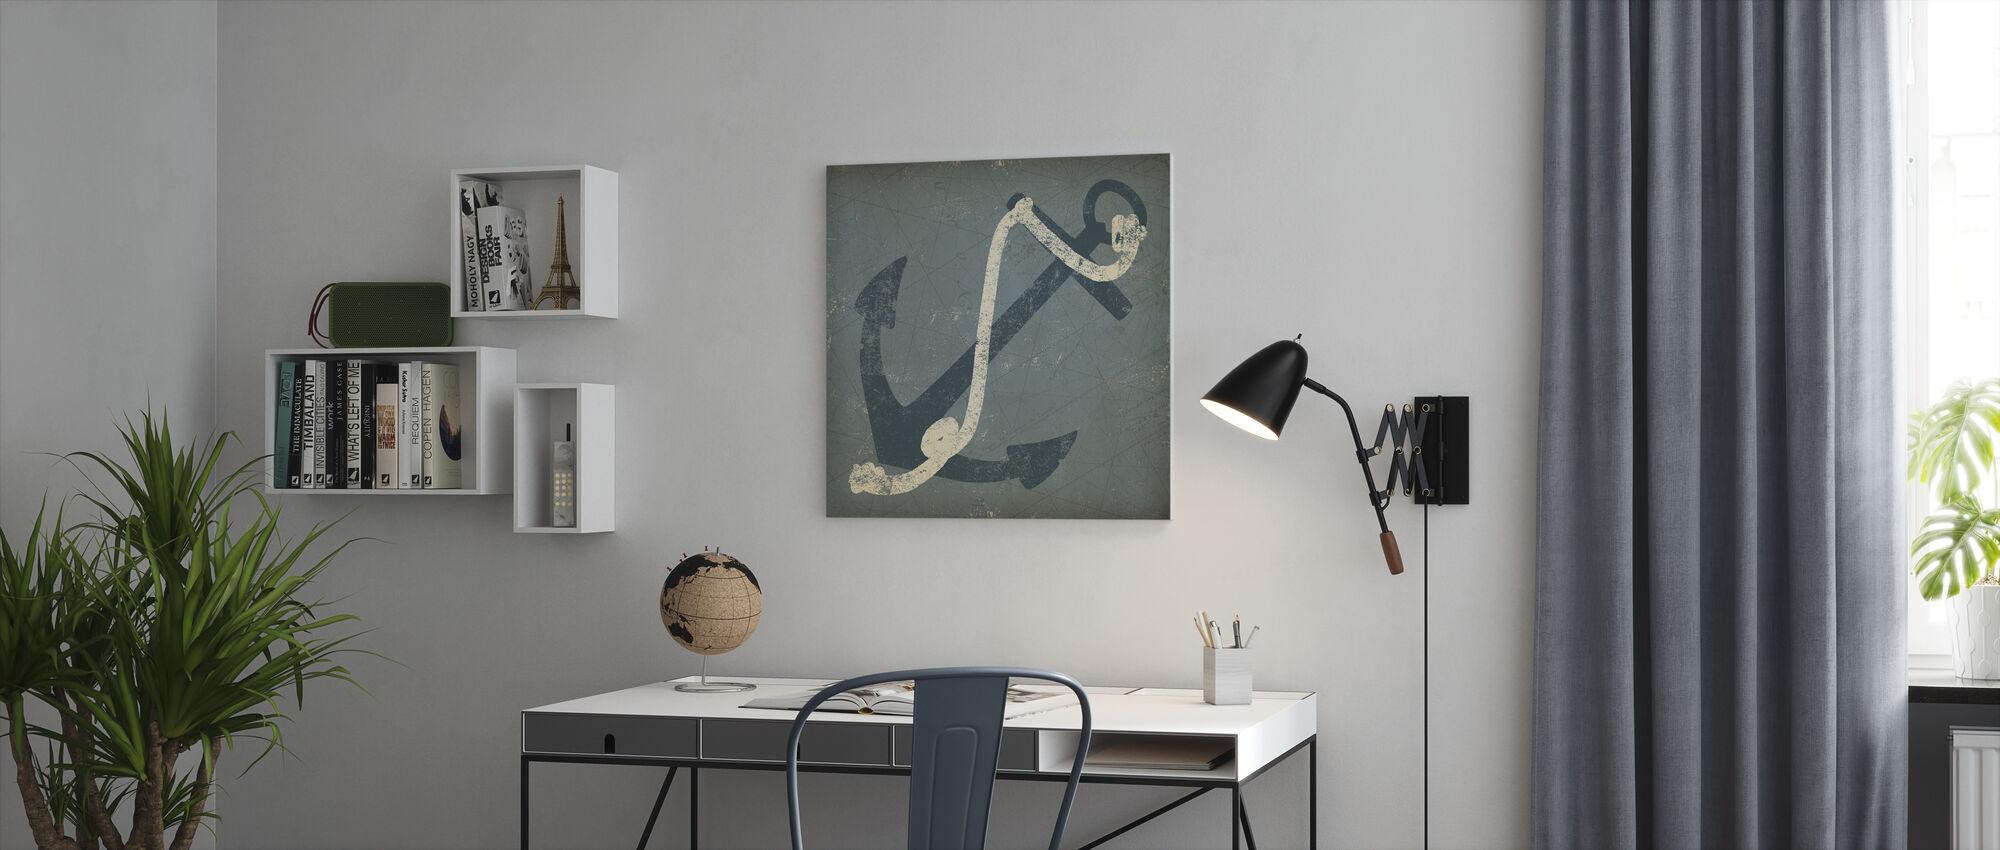 Nautical Anchor 1 - Canvas print - Office